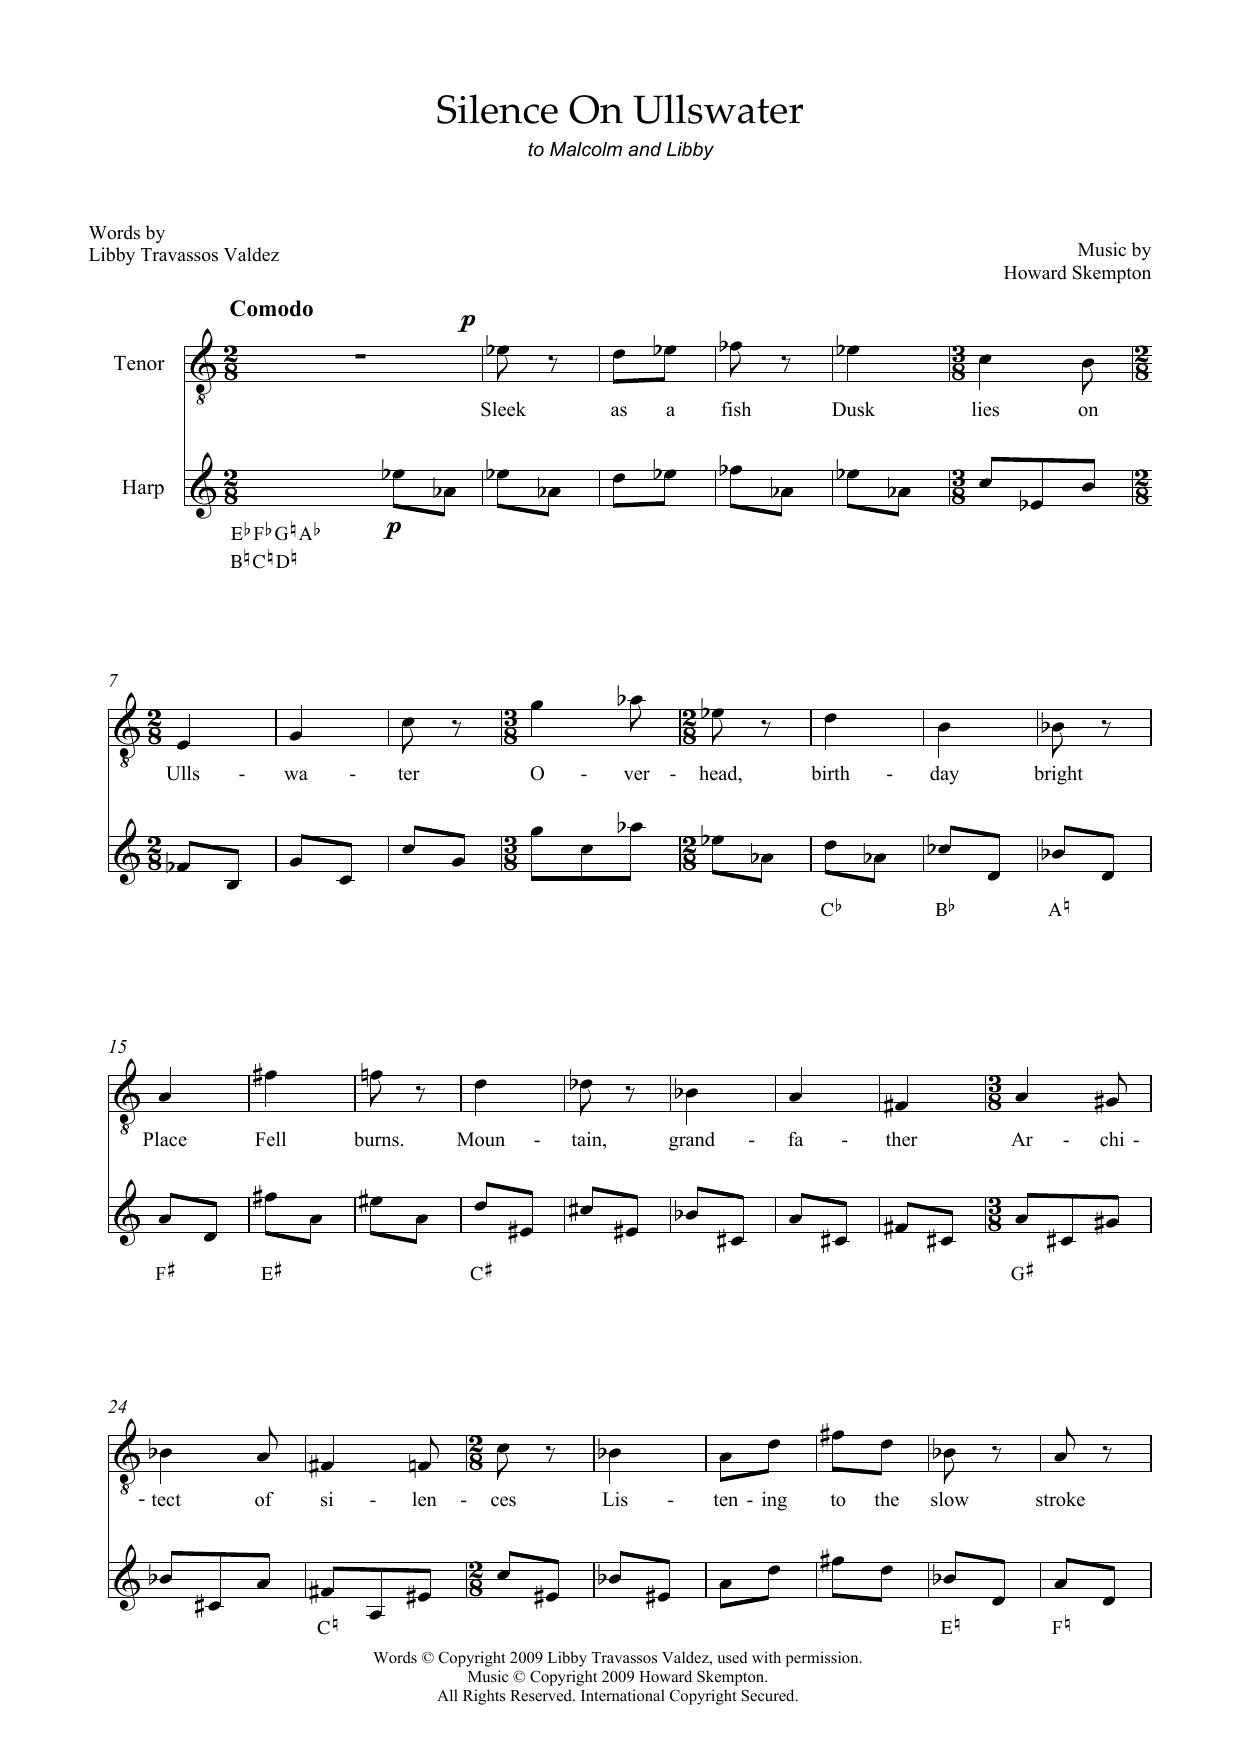 Silence on Ullswater (for tenor and harp) Sheet Music